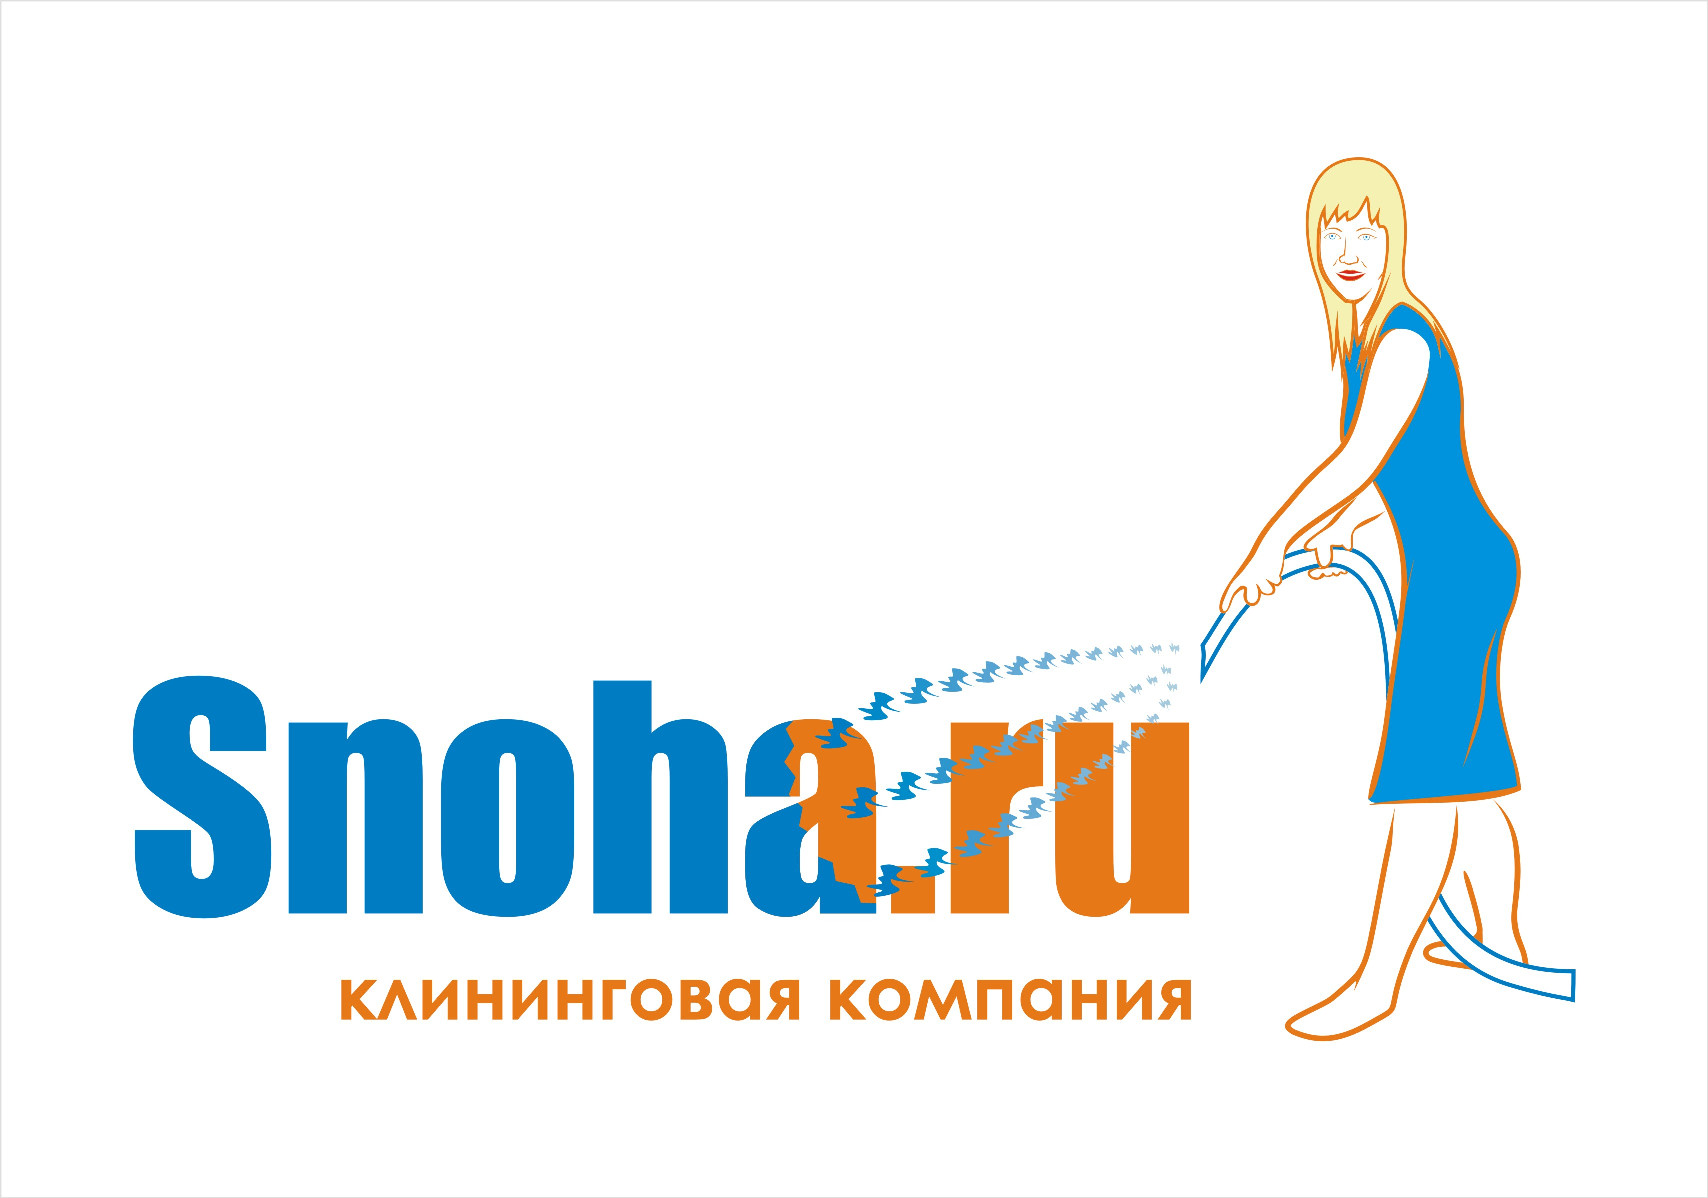 Логотип клининговой компании, сайт snoha.ru фото f_96754a9e9e33f2dc.jpg